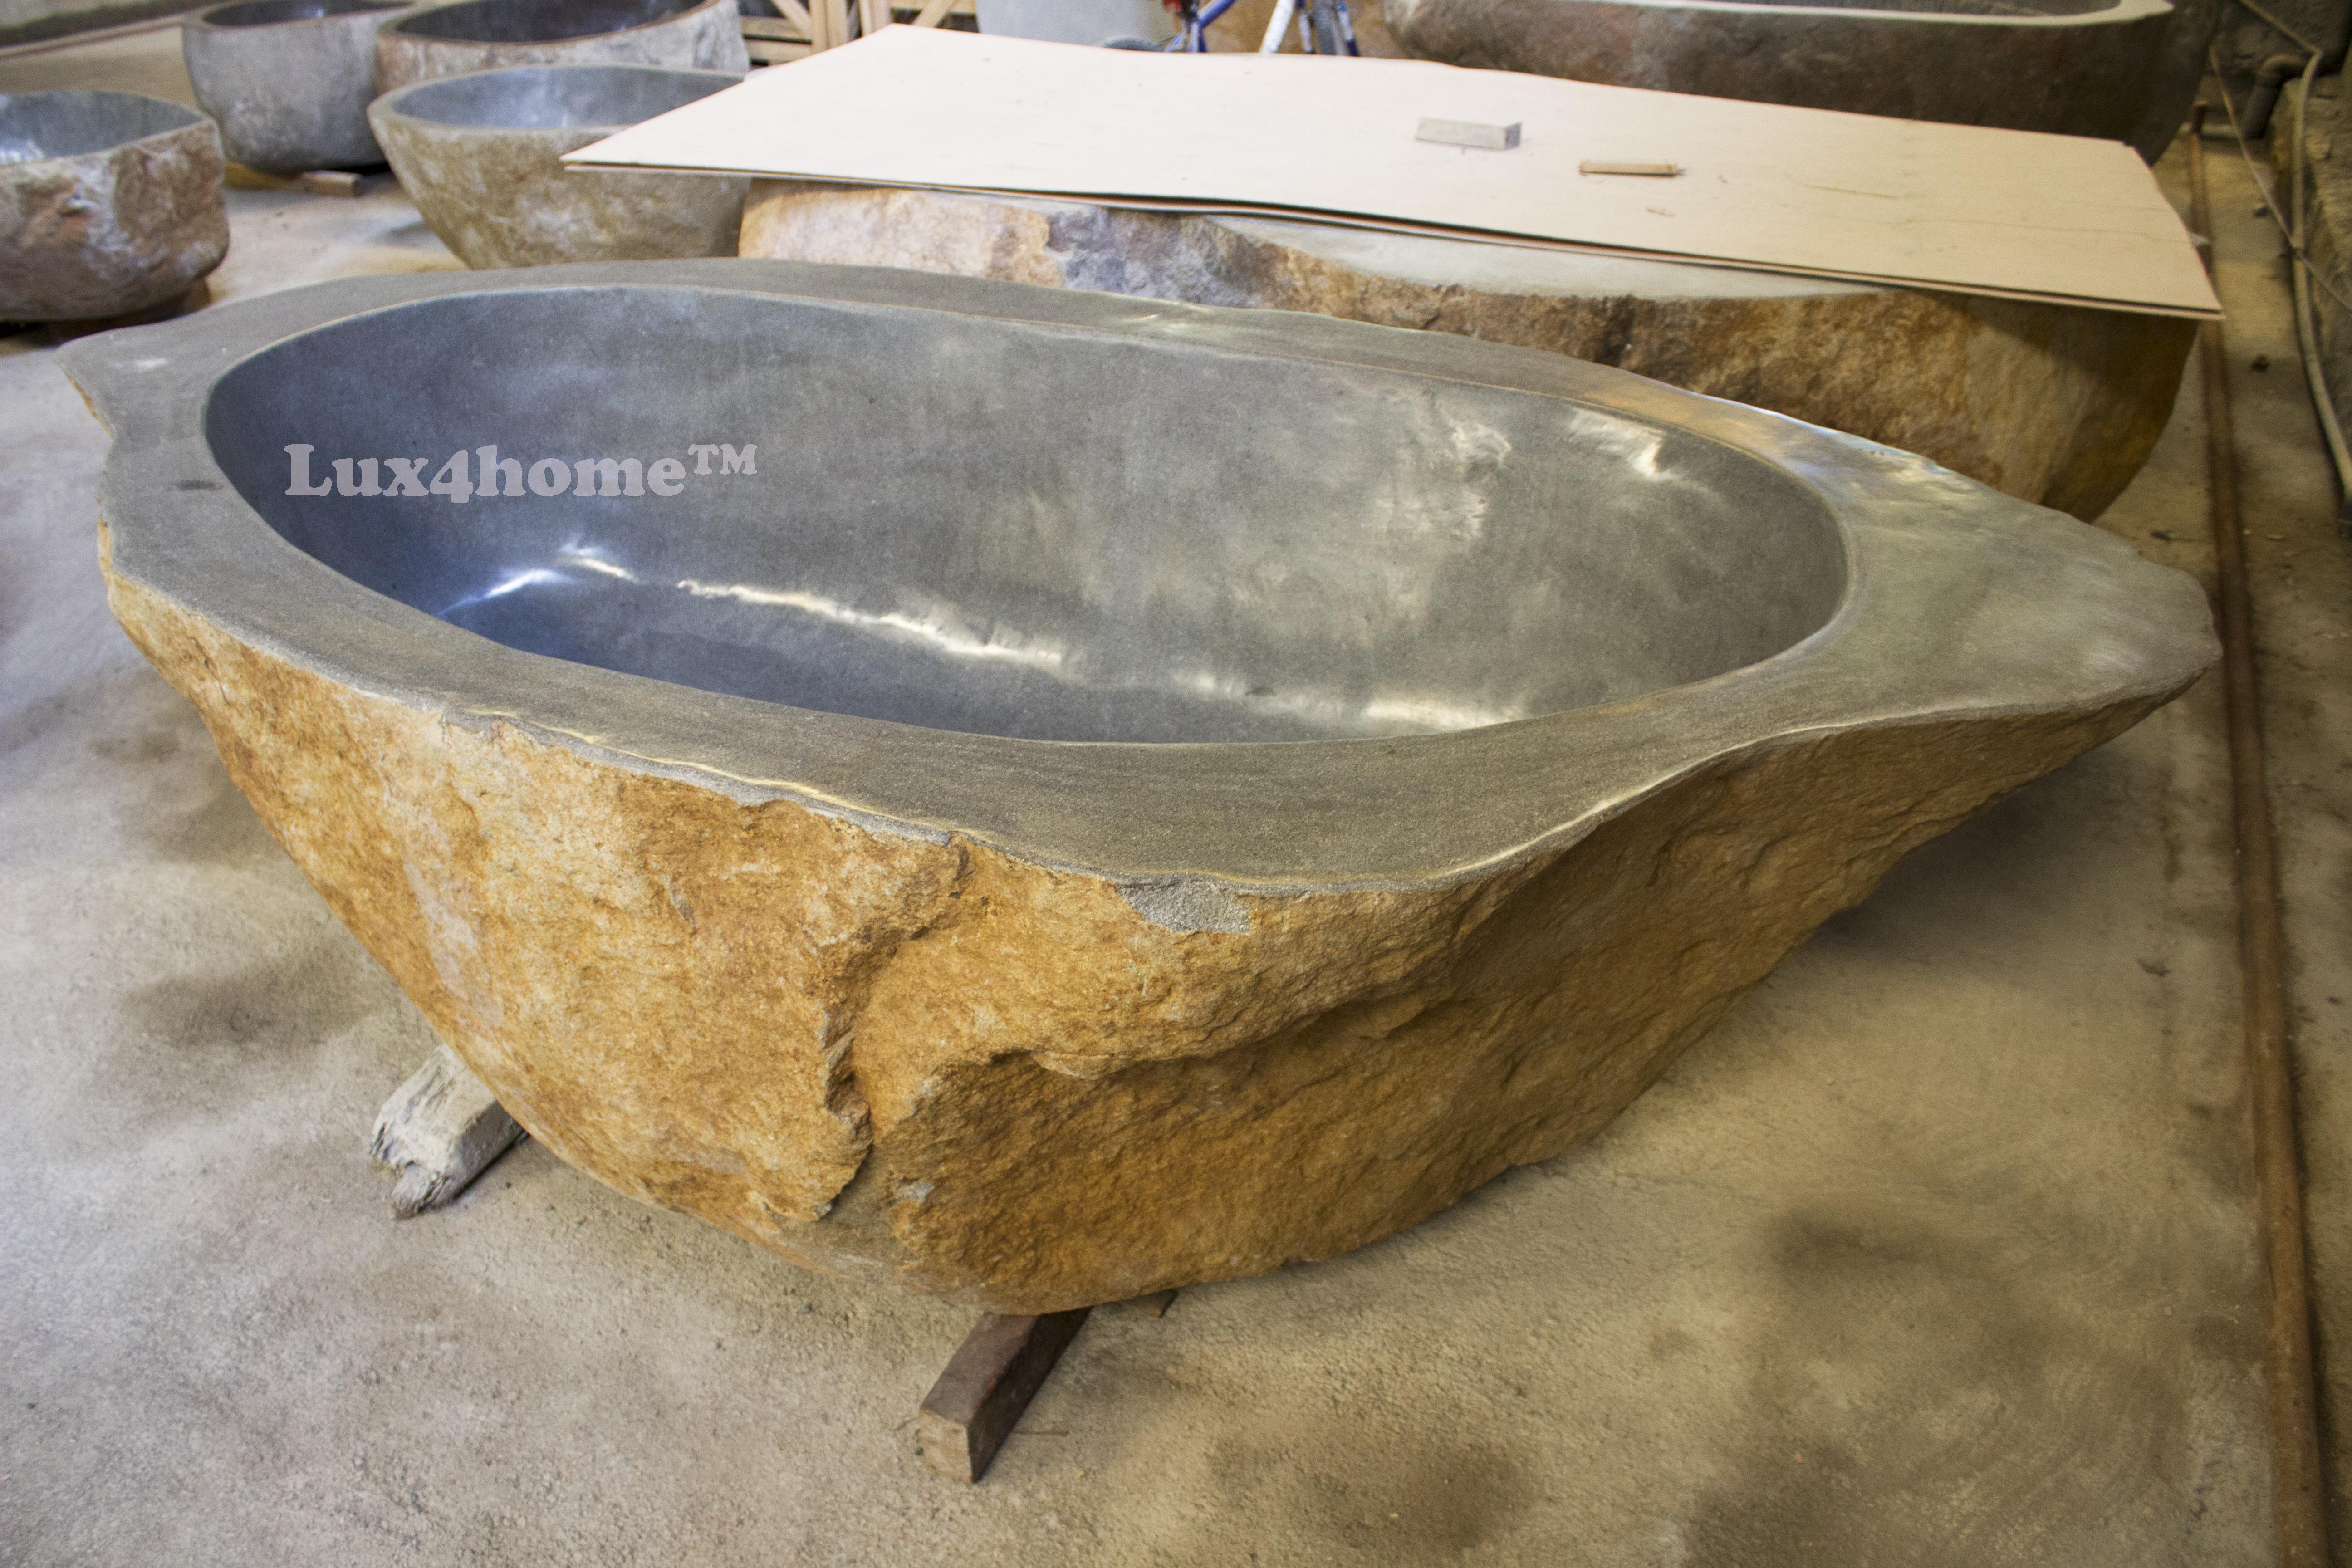 Soaking Stone Bathtubs Indonesia - Bali for sale